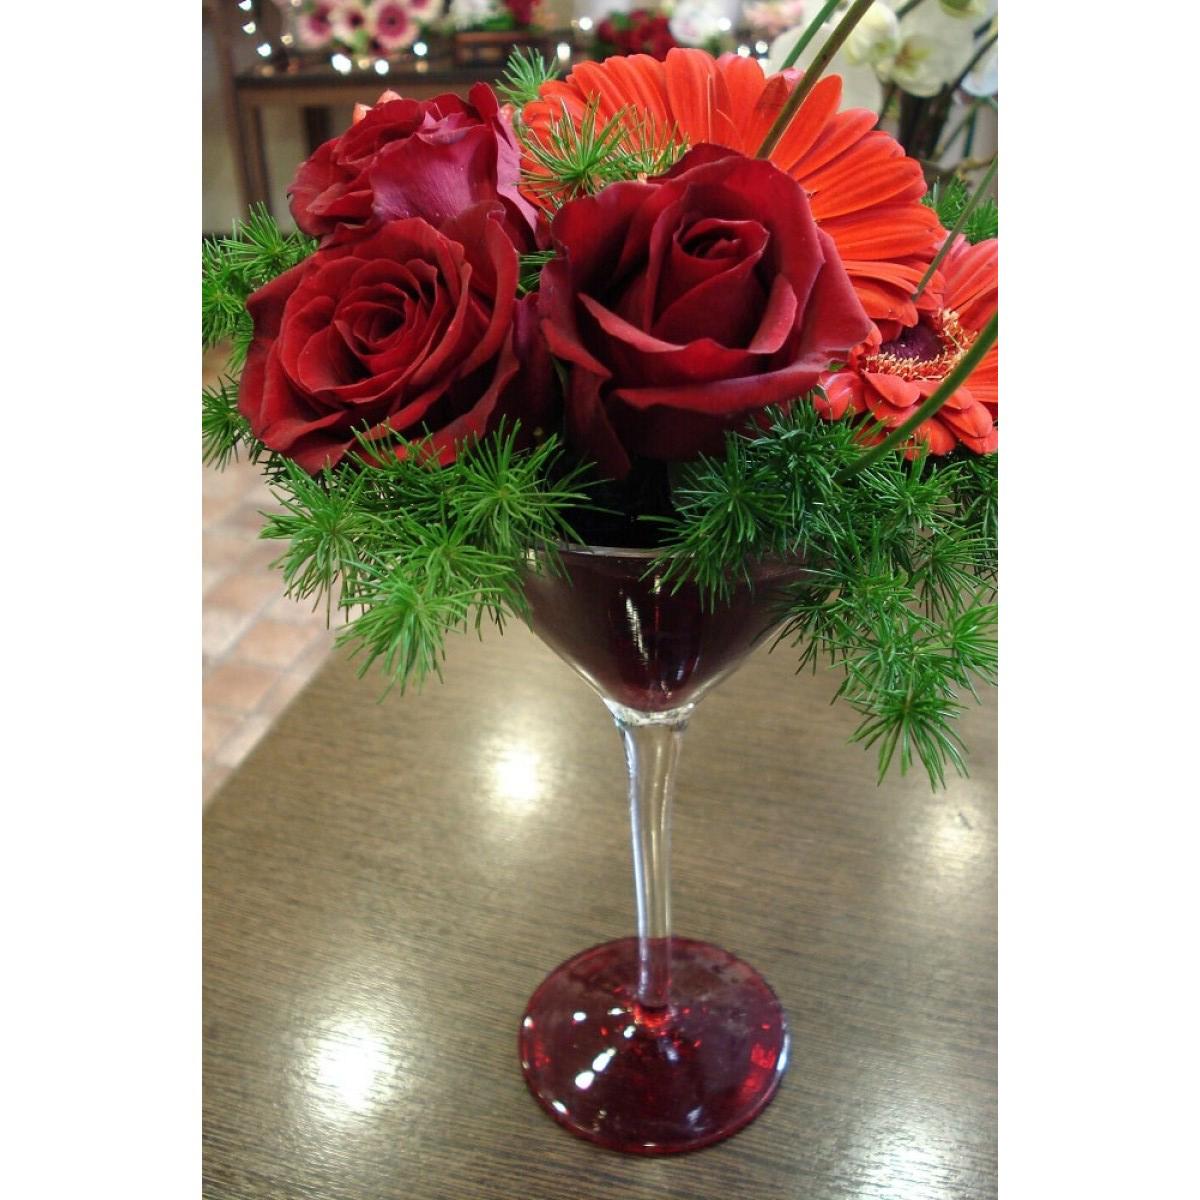 5c2cd371cdc Σύνθεση λουλουδιών σε ποτήρι